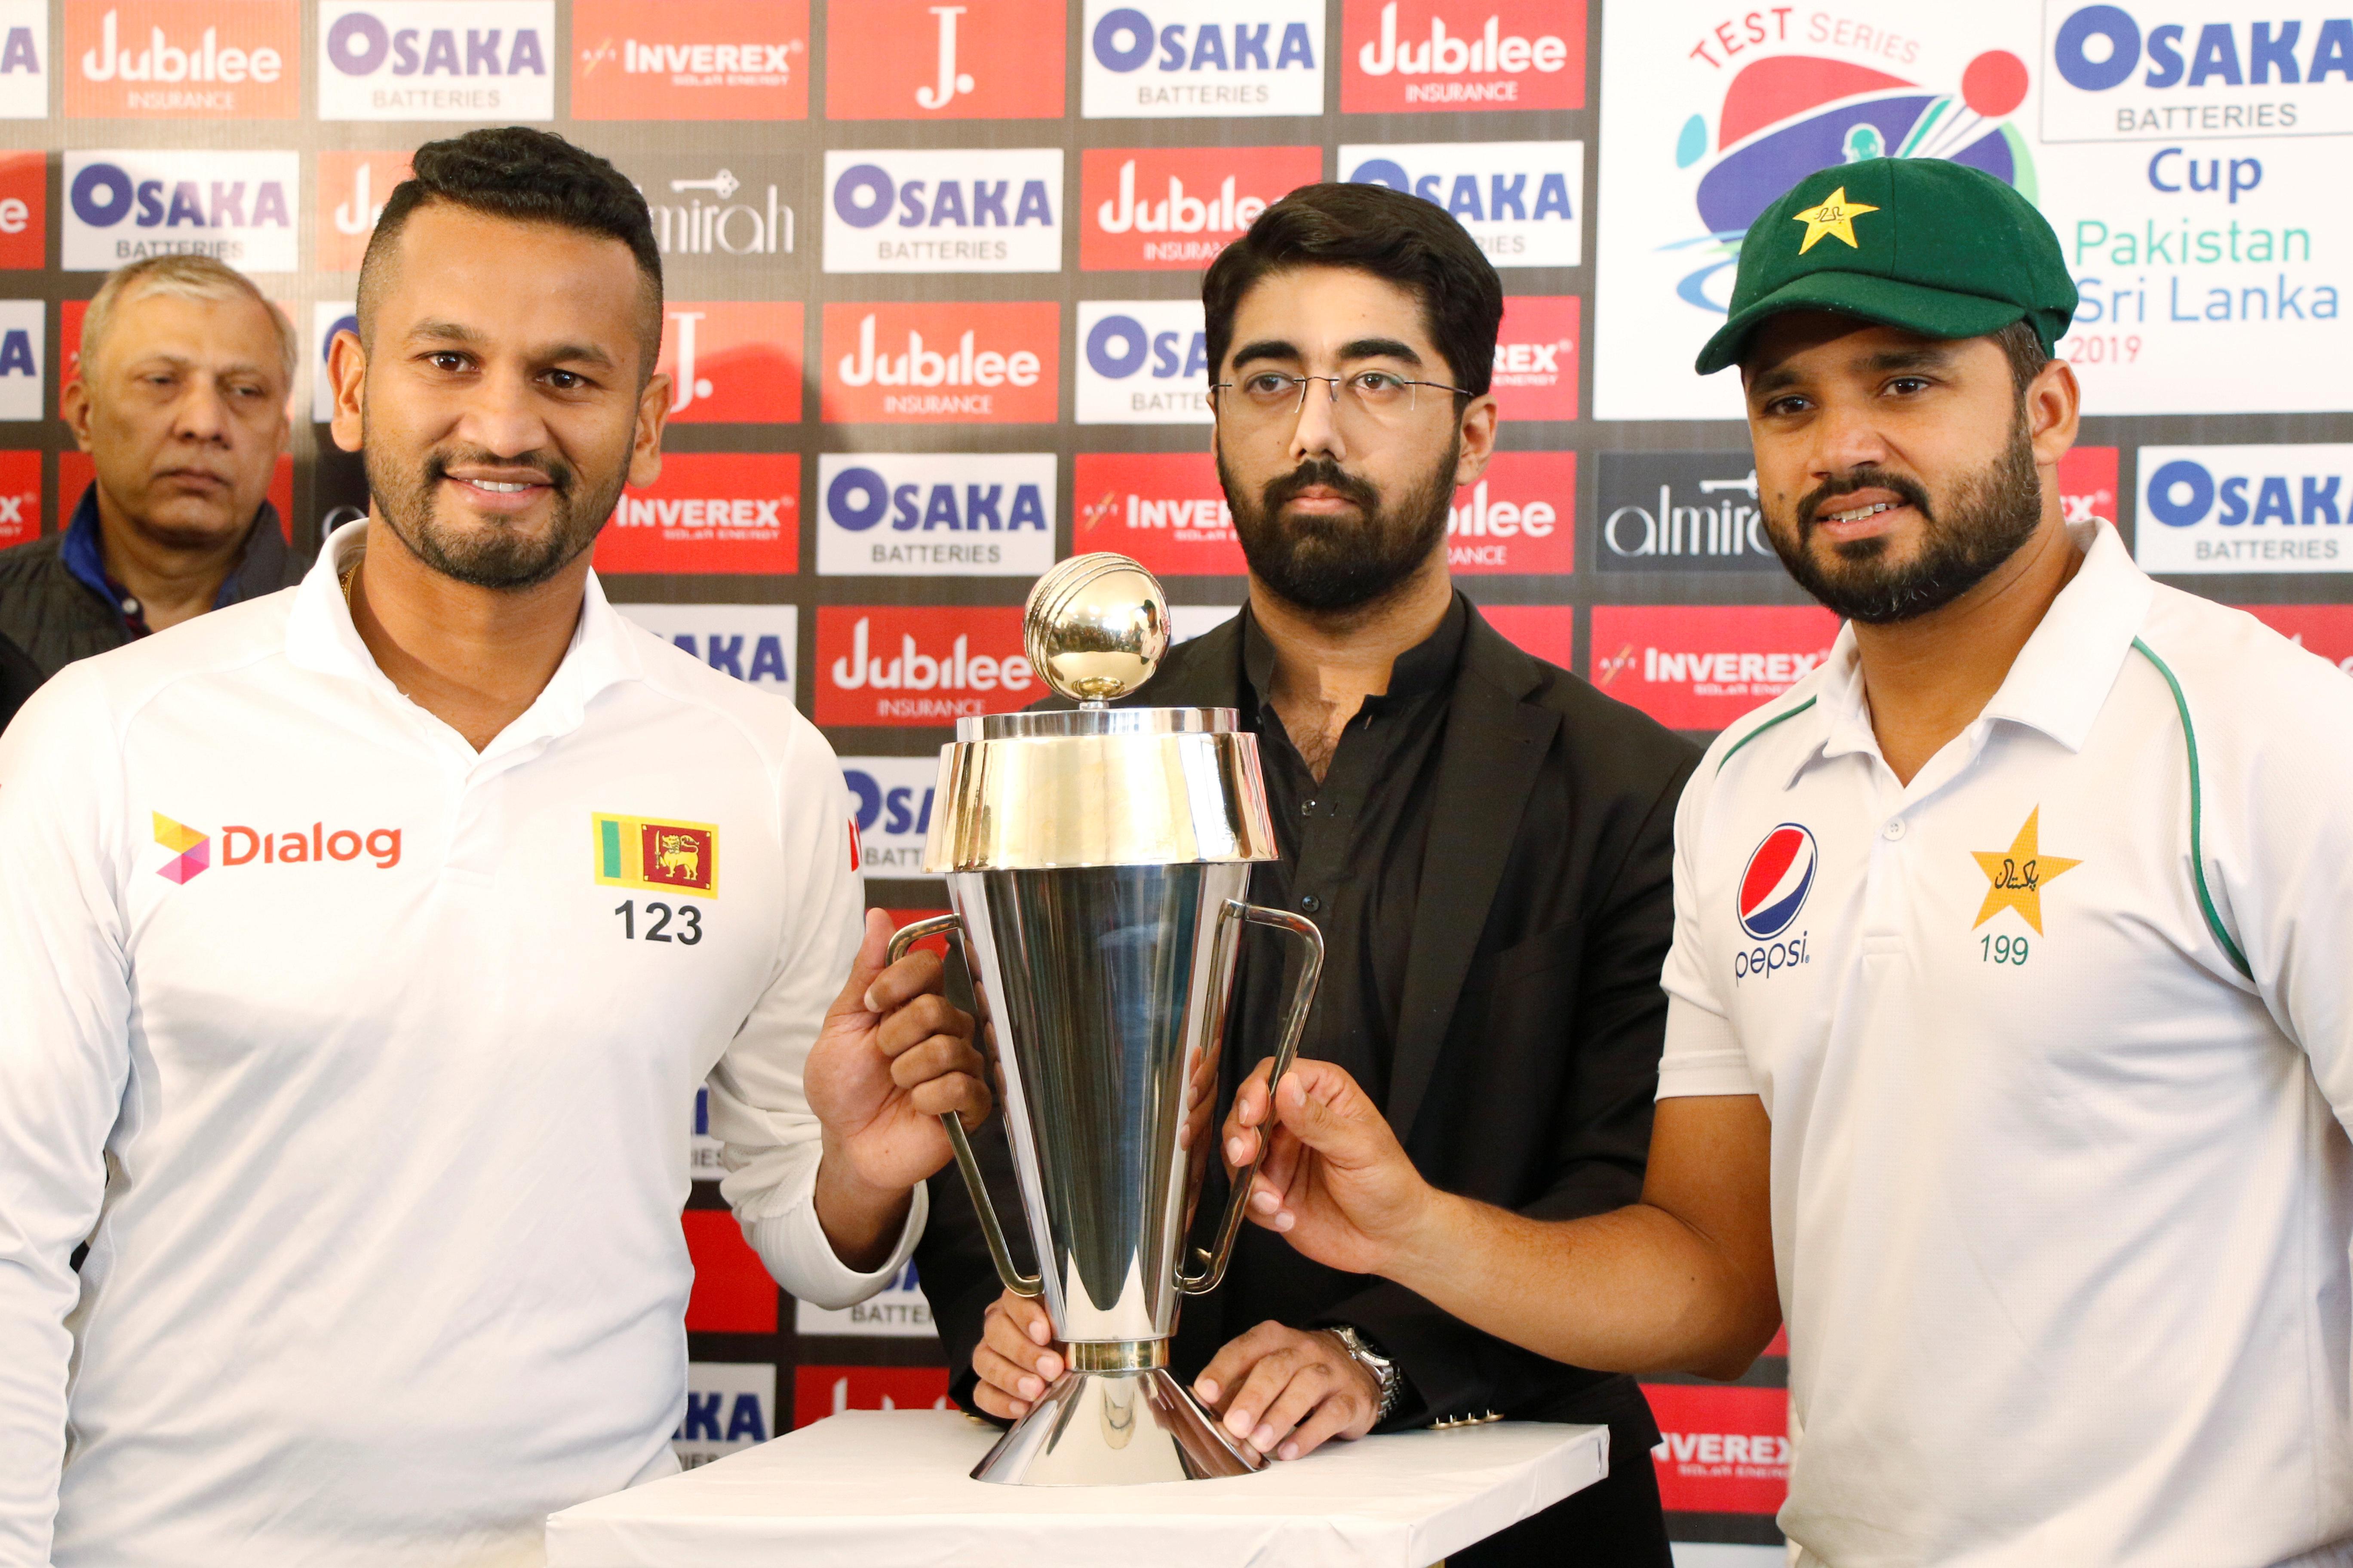 Naseem leads fightback as Pakistan host first test in a decade